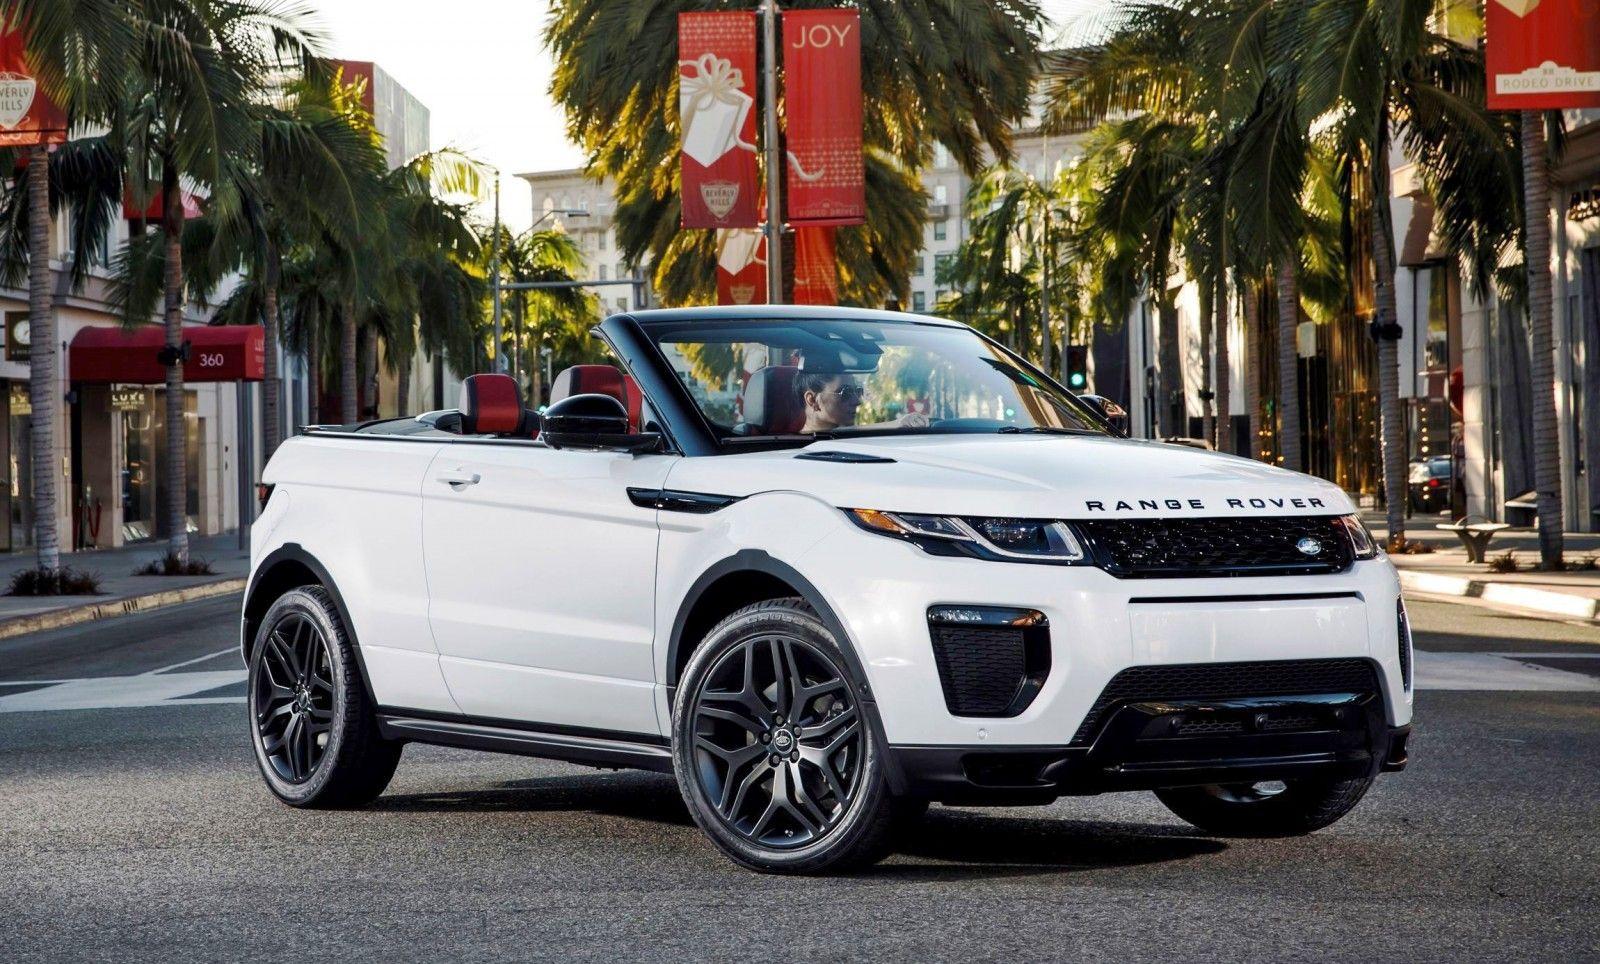 2016 Range Rover Evoque Convertible La Range Rover Evoque Convertible Range Rover Convertible Luxury Cars Range Rover